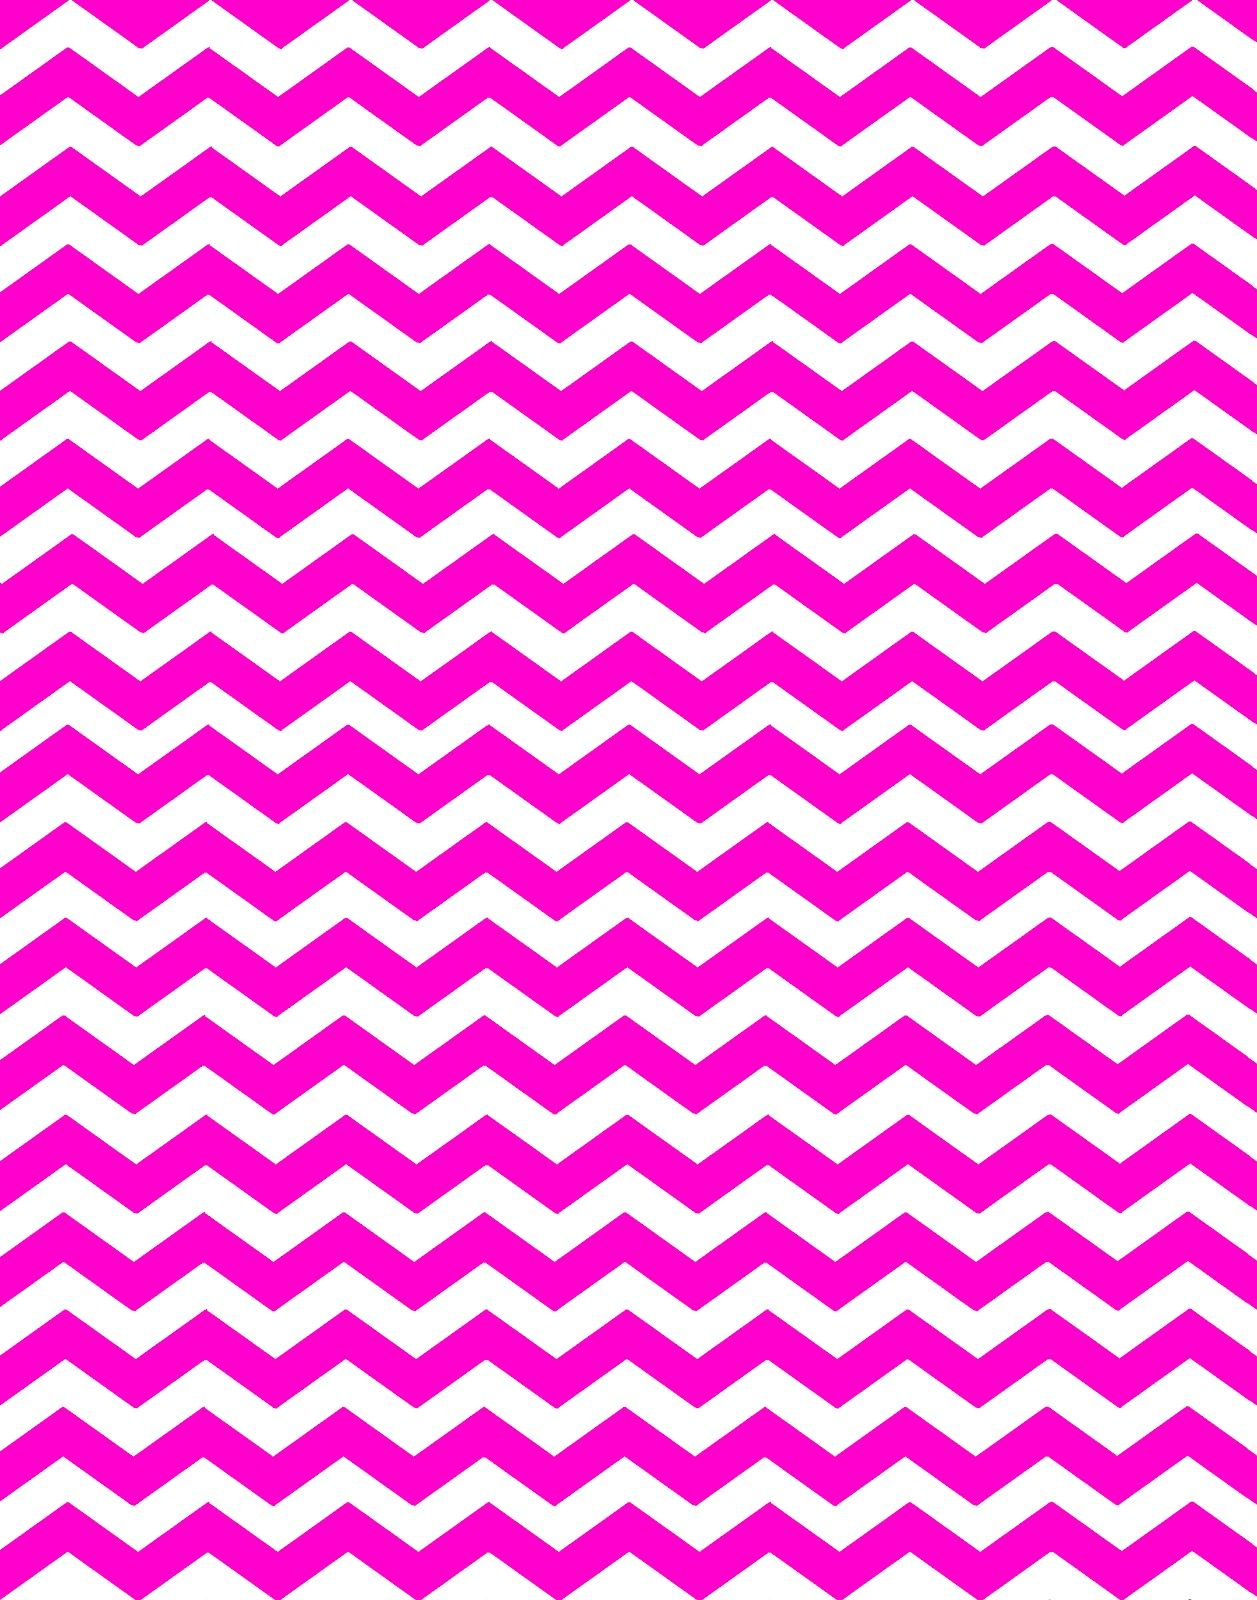 16 New Colors Chevron background patterns! Chevron